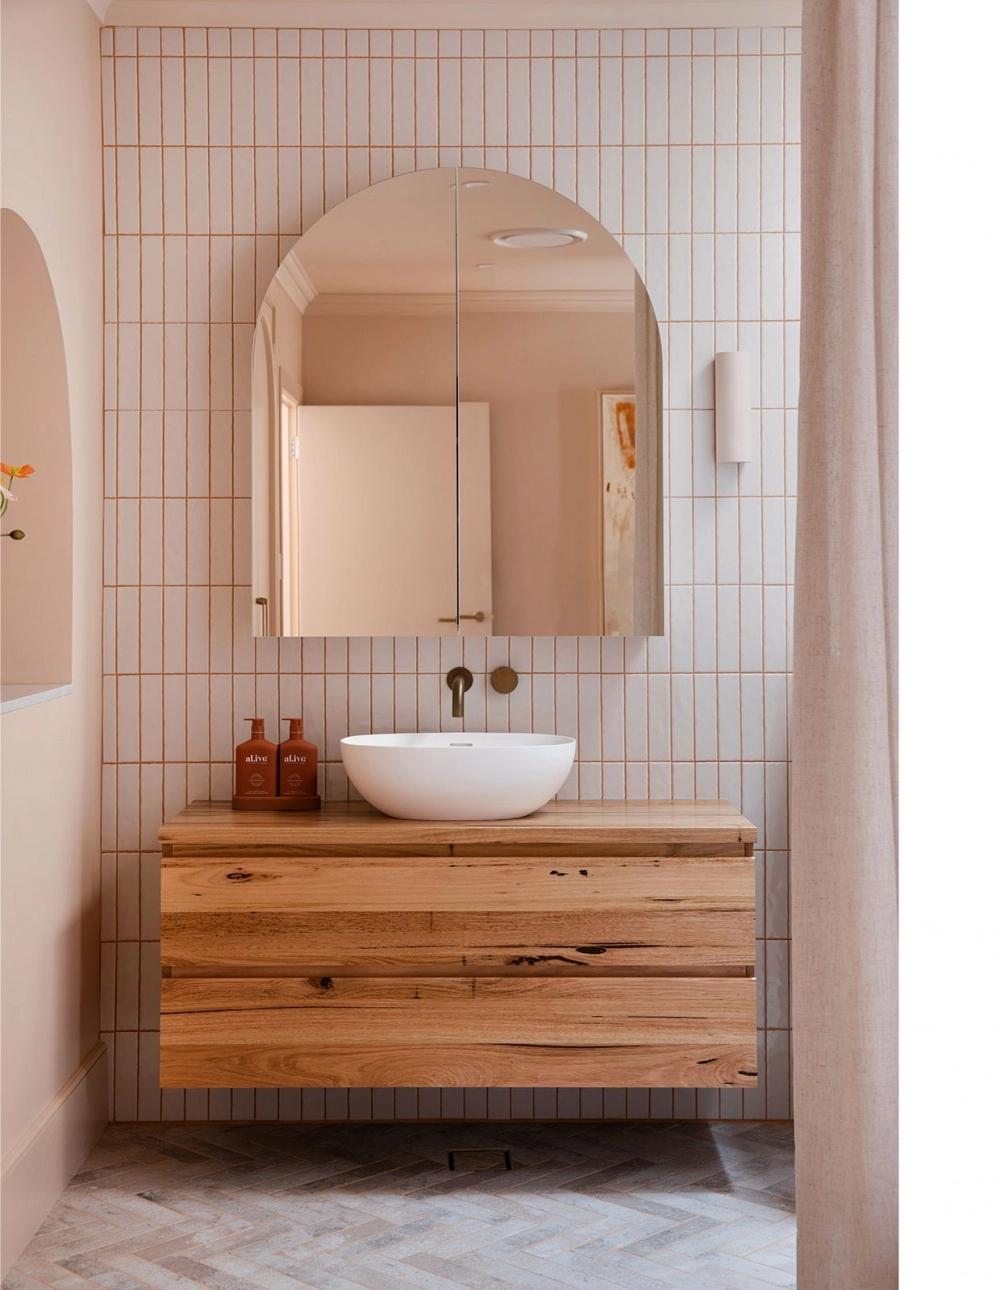 Three Birds Renovation - Double Arch Mirror Cabinet